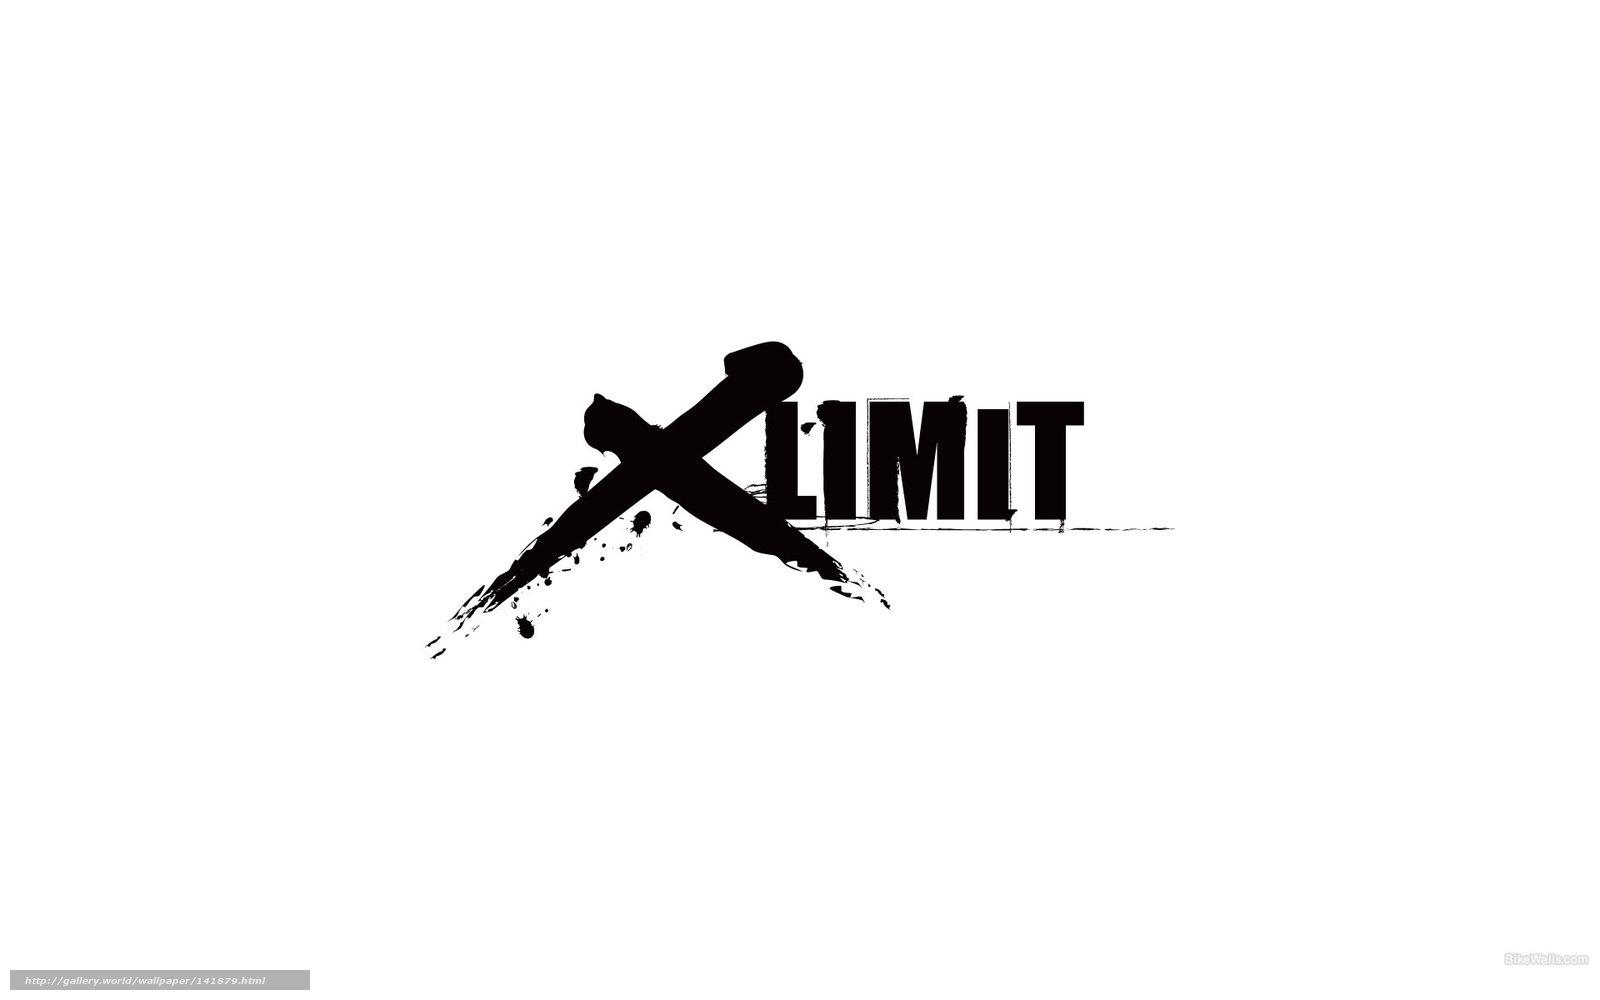 pobra tapety MBK, Enduro, X-Limit Enduro, X-Limit Enduro